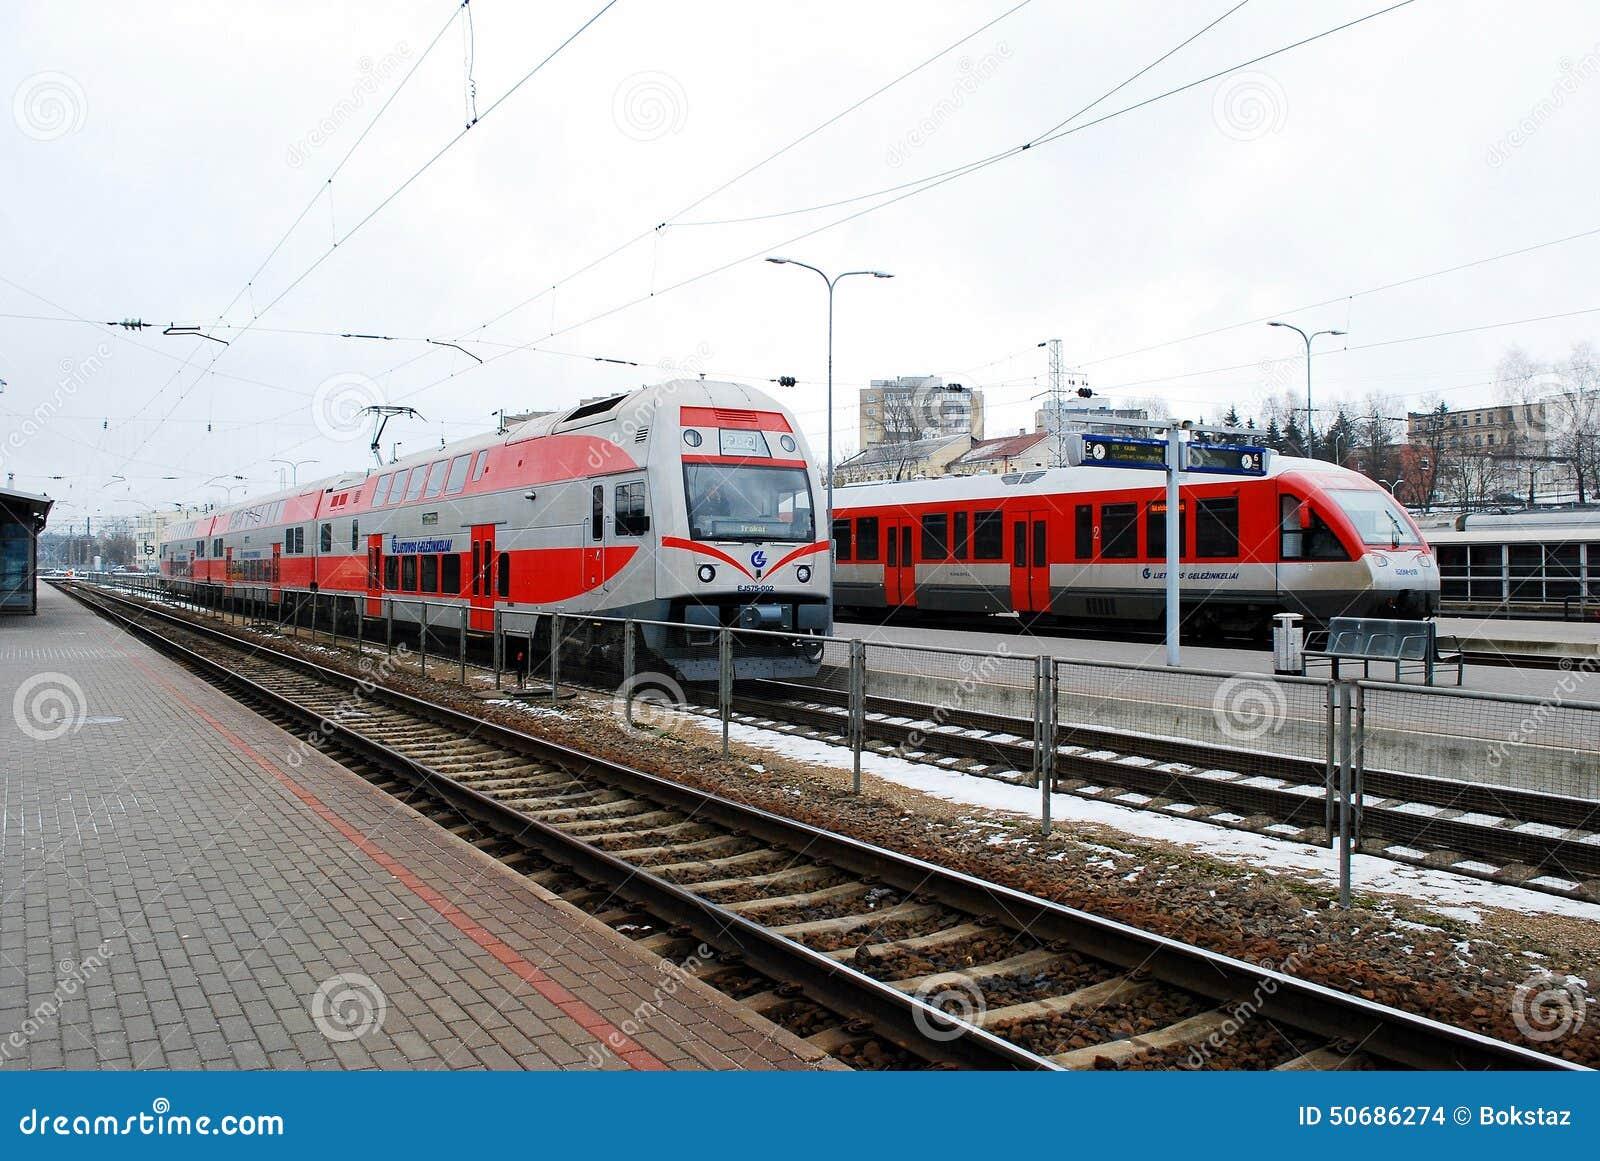 Download 火车站在立陶宛维尔纽斯市的首都 编辑类库存图片. 图片 包括有 蠢材, 人们, 城市, 场面, 铁路, 中央 - 50686274